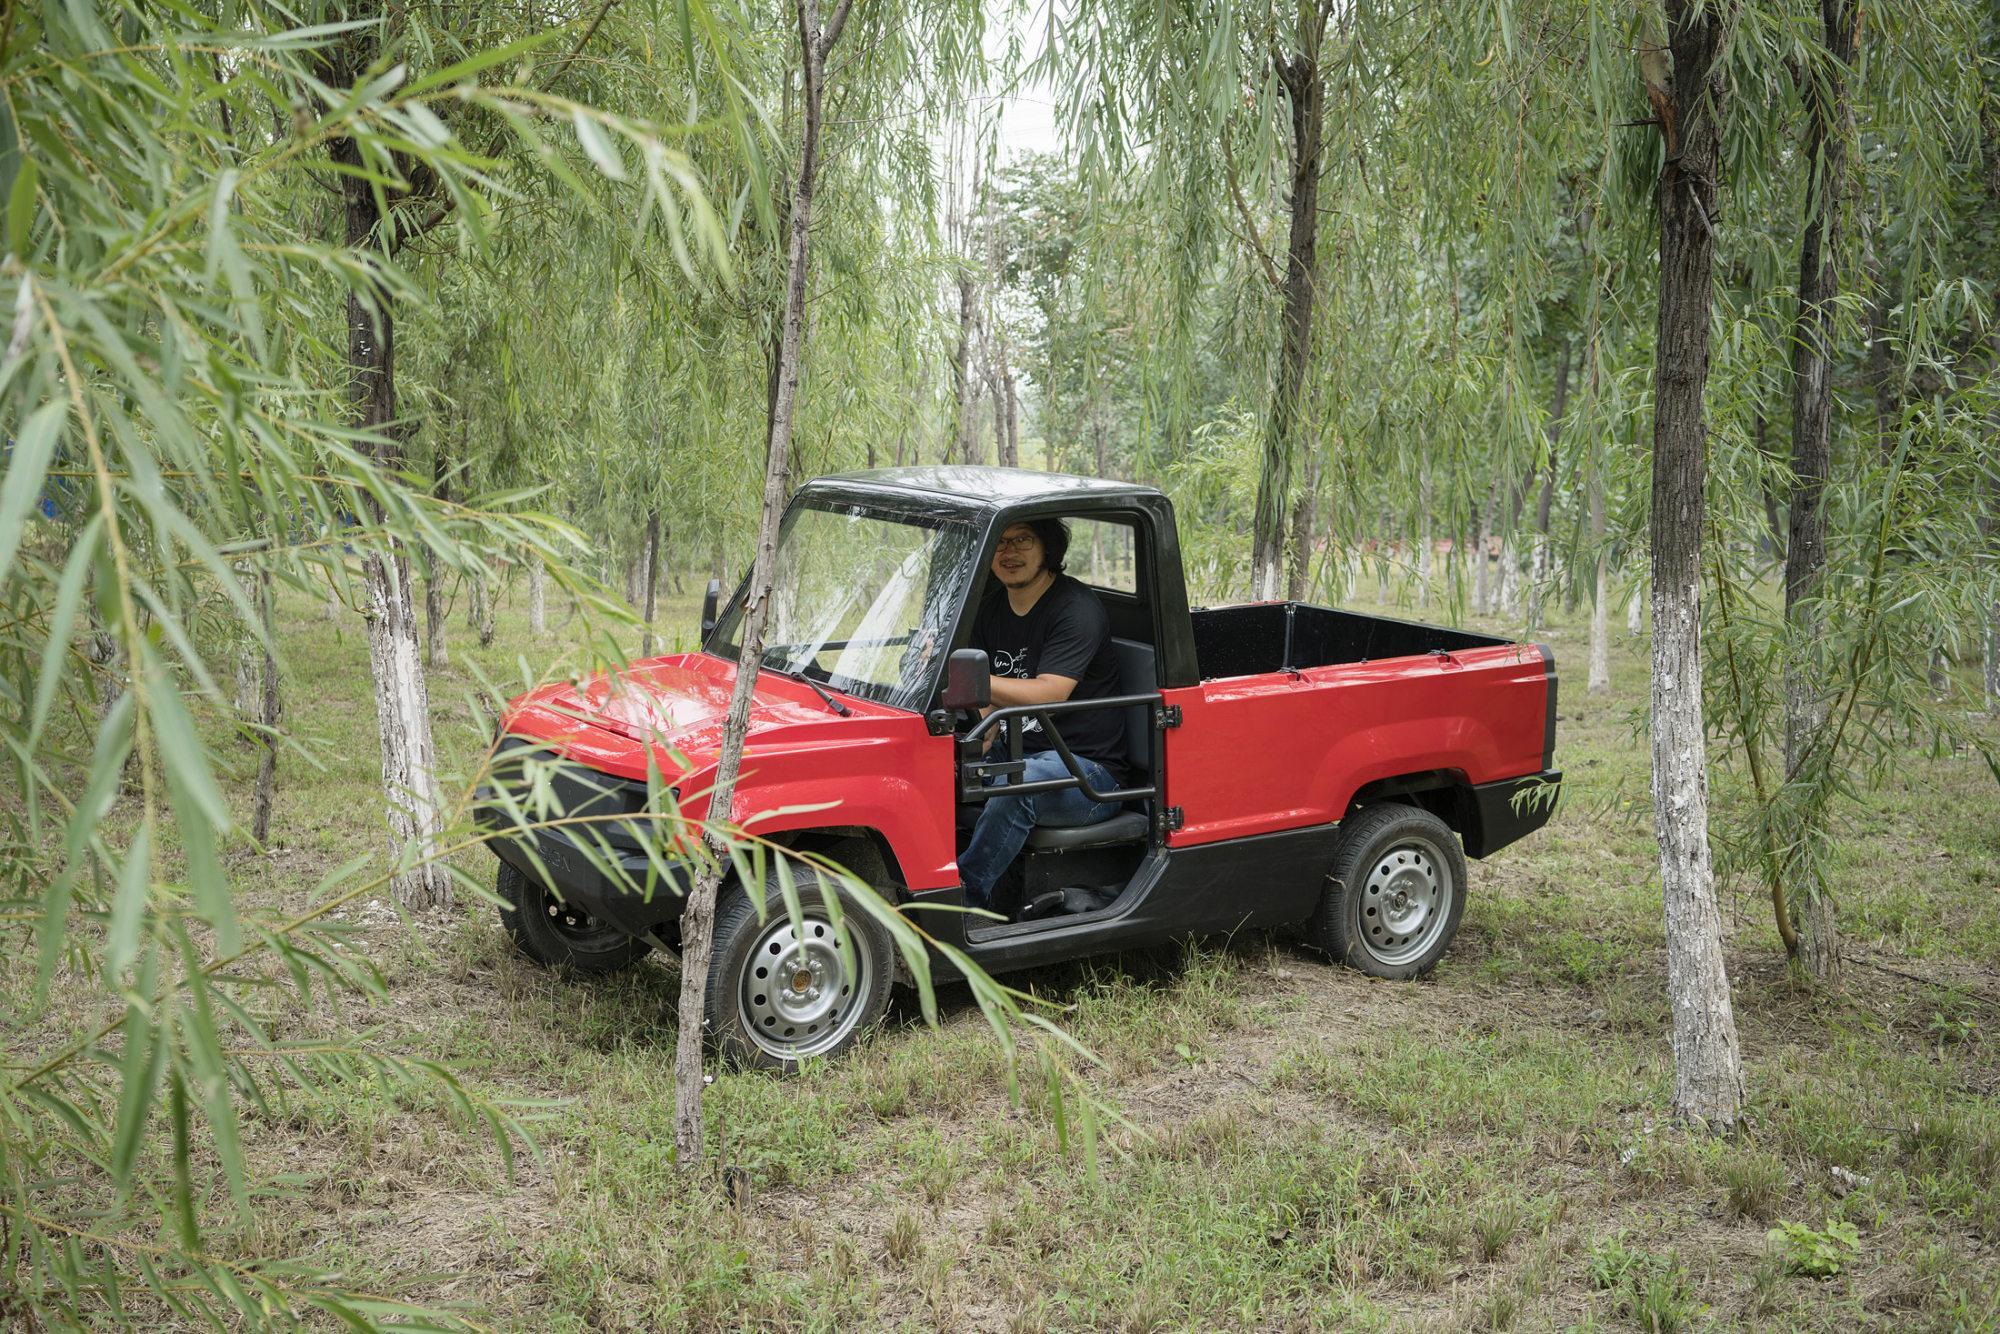 Tiny Truck Tiny Truck Maker Shows Chinas Electric Car Startups Run On Big